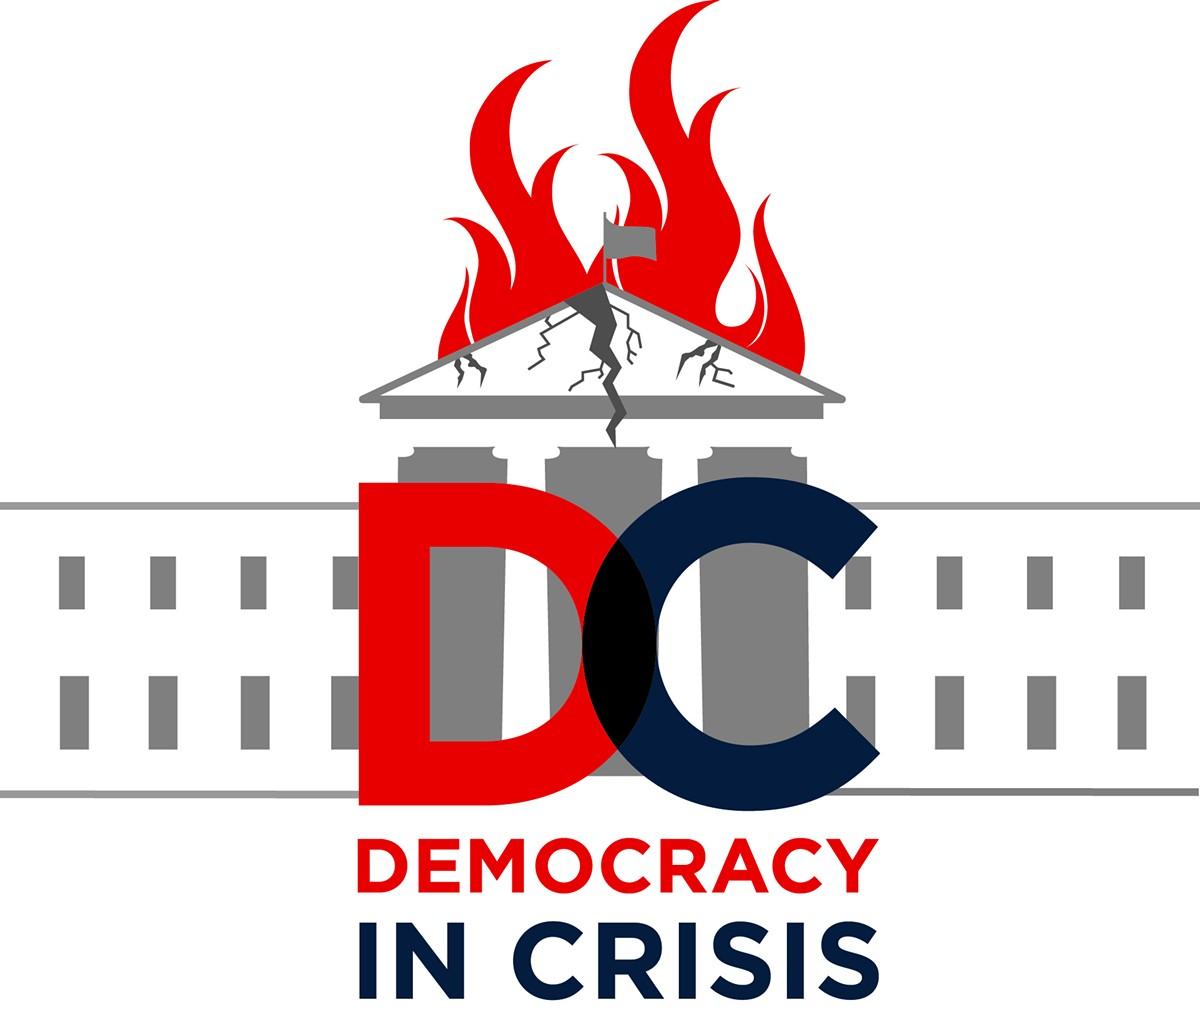 democracy-in-crisis_01_29_17.jpg